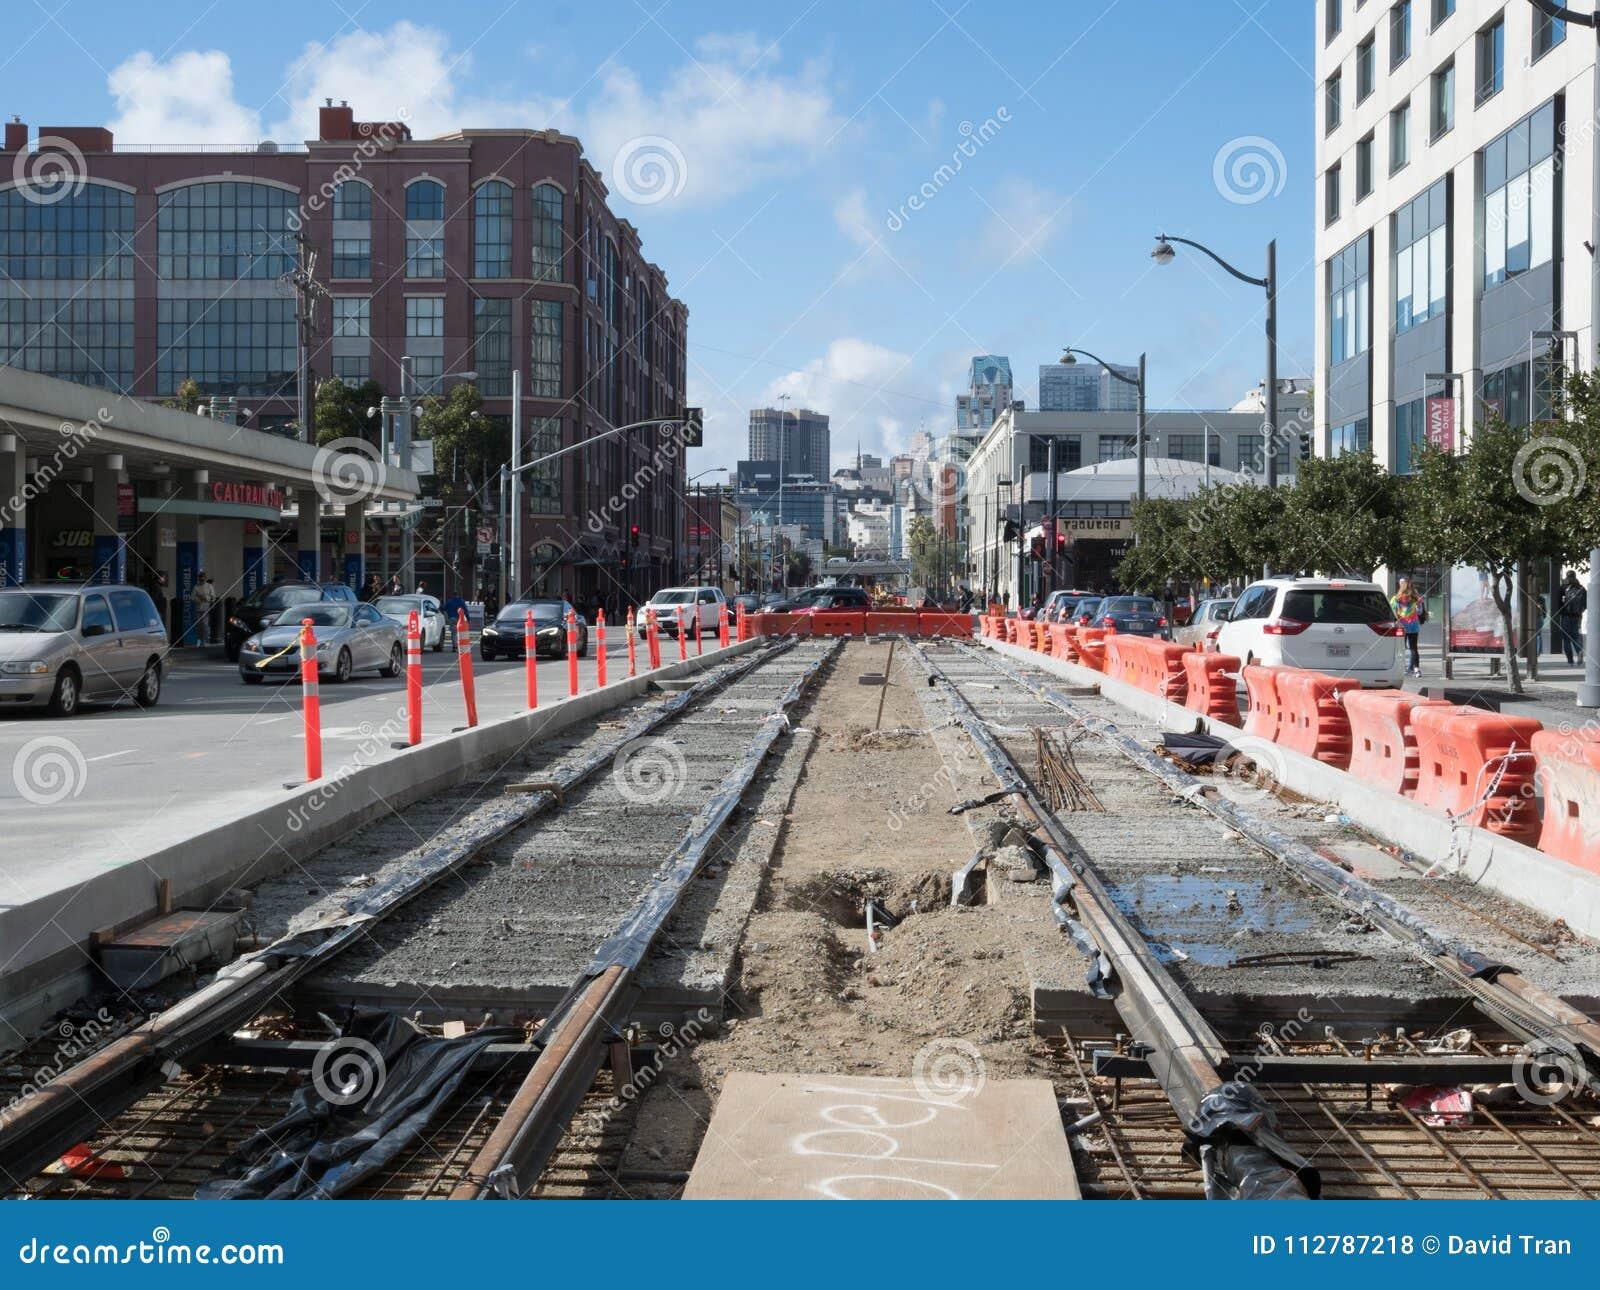 Transportation construction in San Francisco